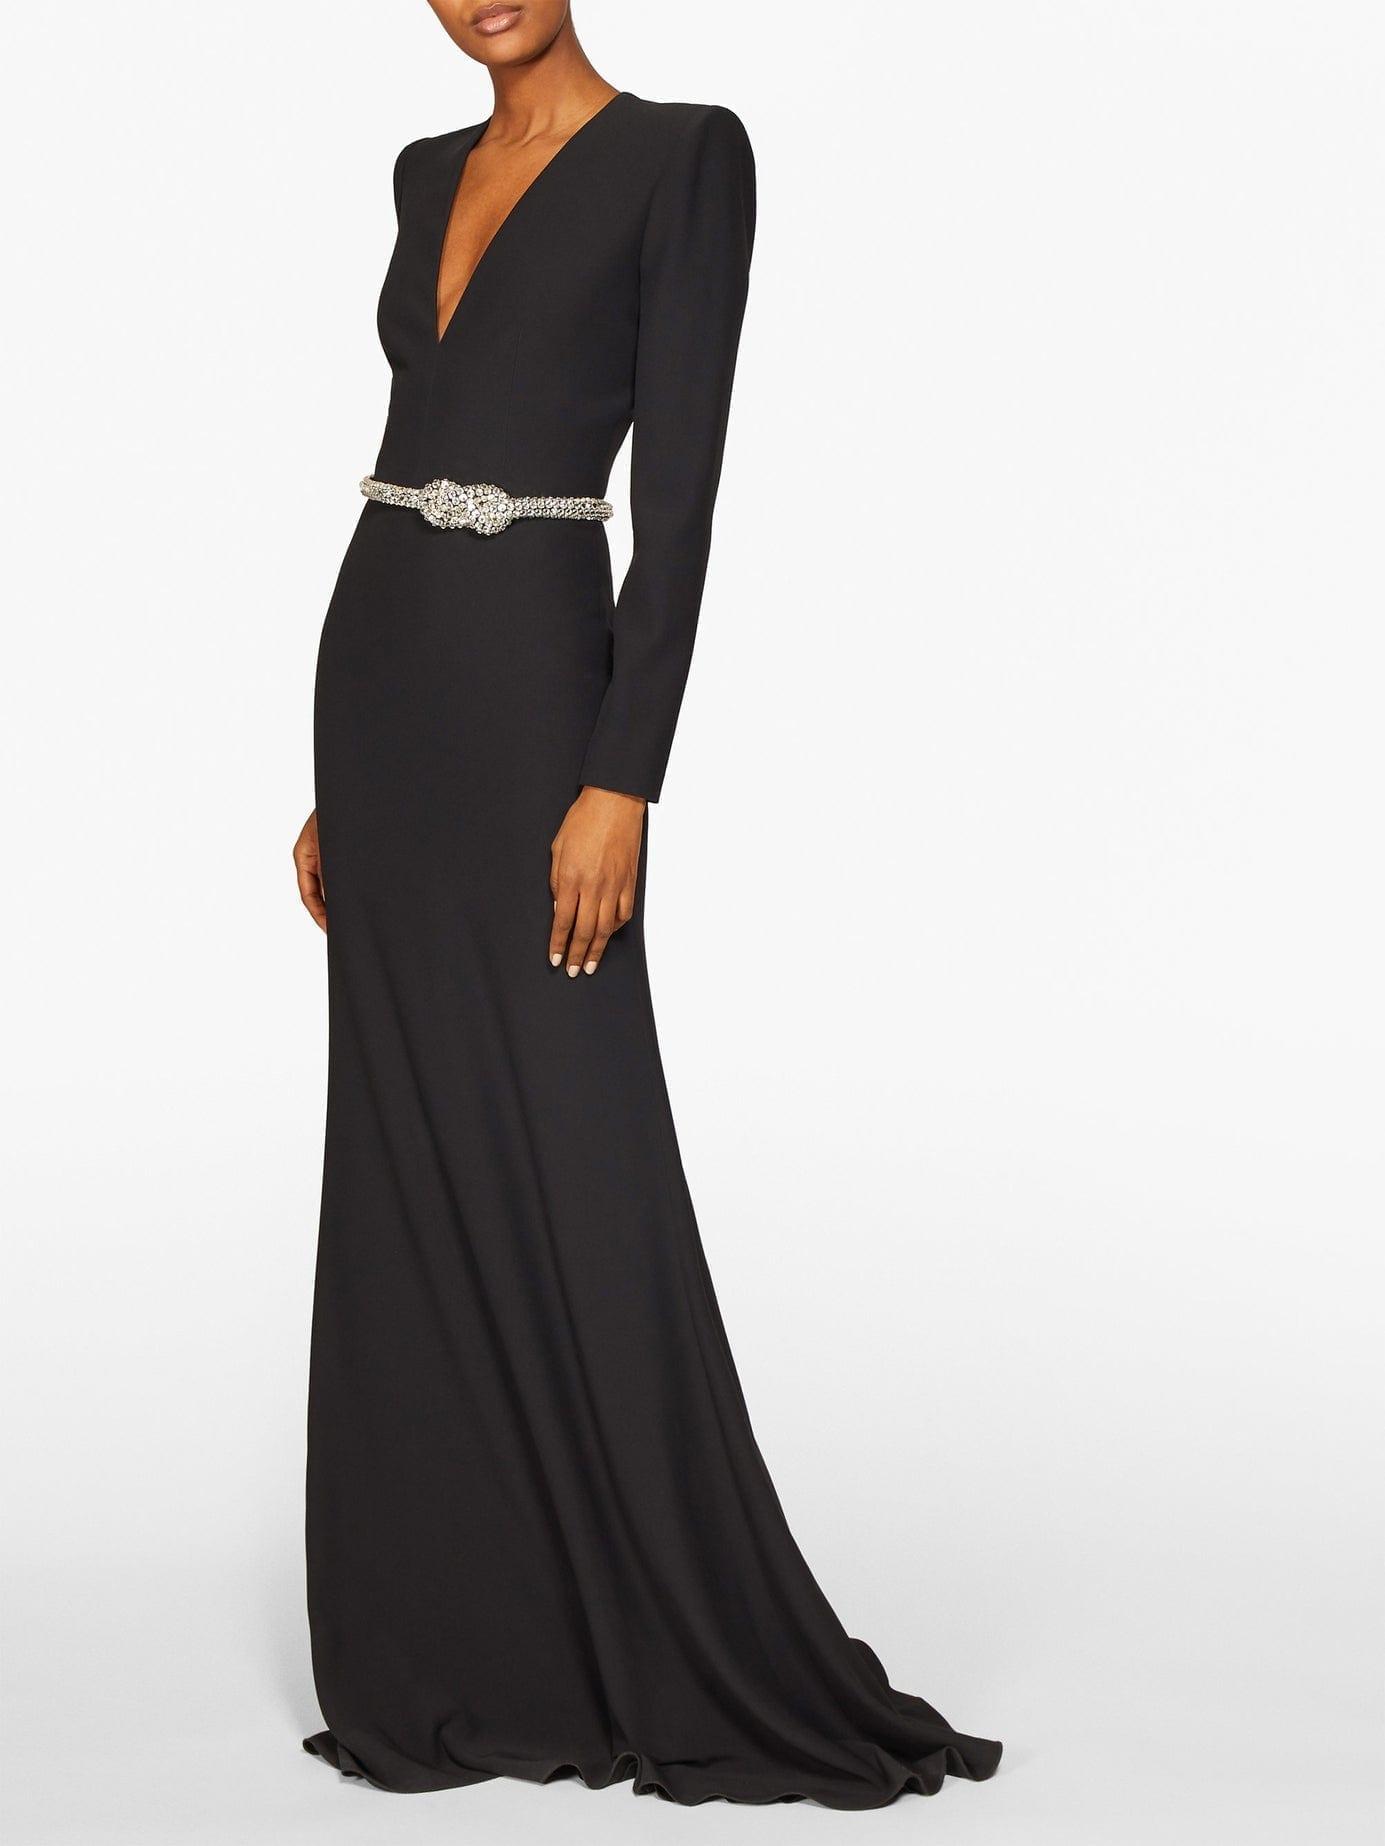 ALEXANDER MCQUEEN Crystal-Embellished Belted Gown